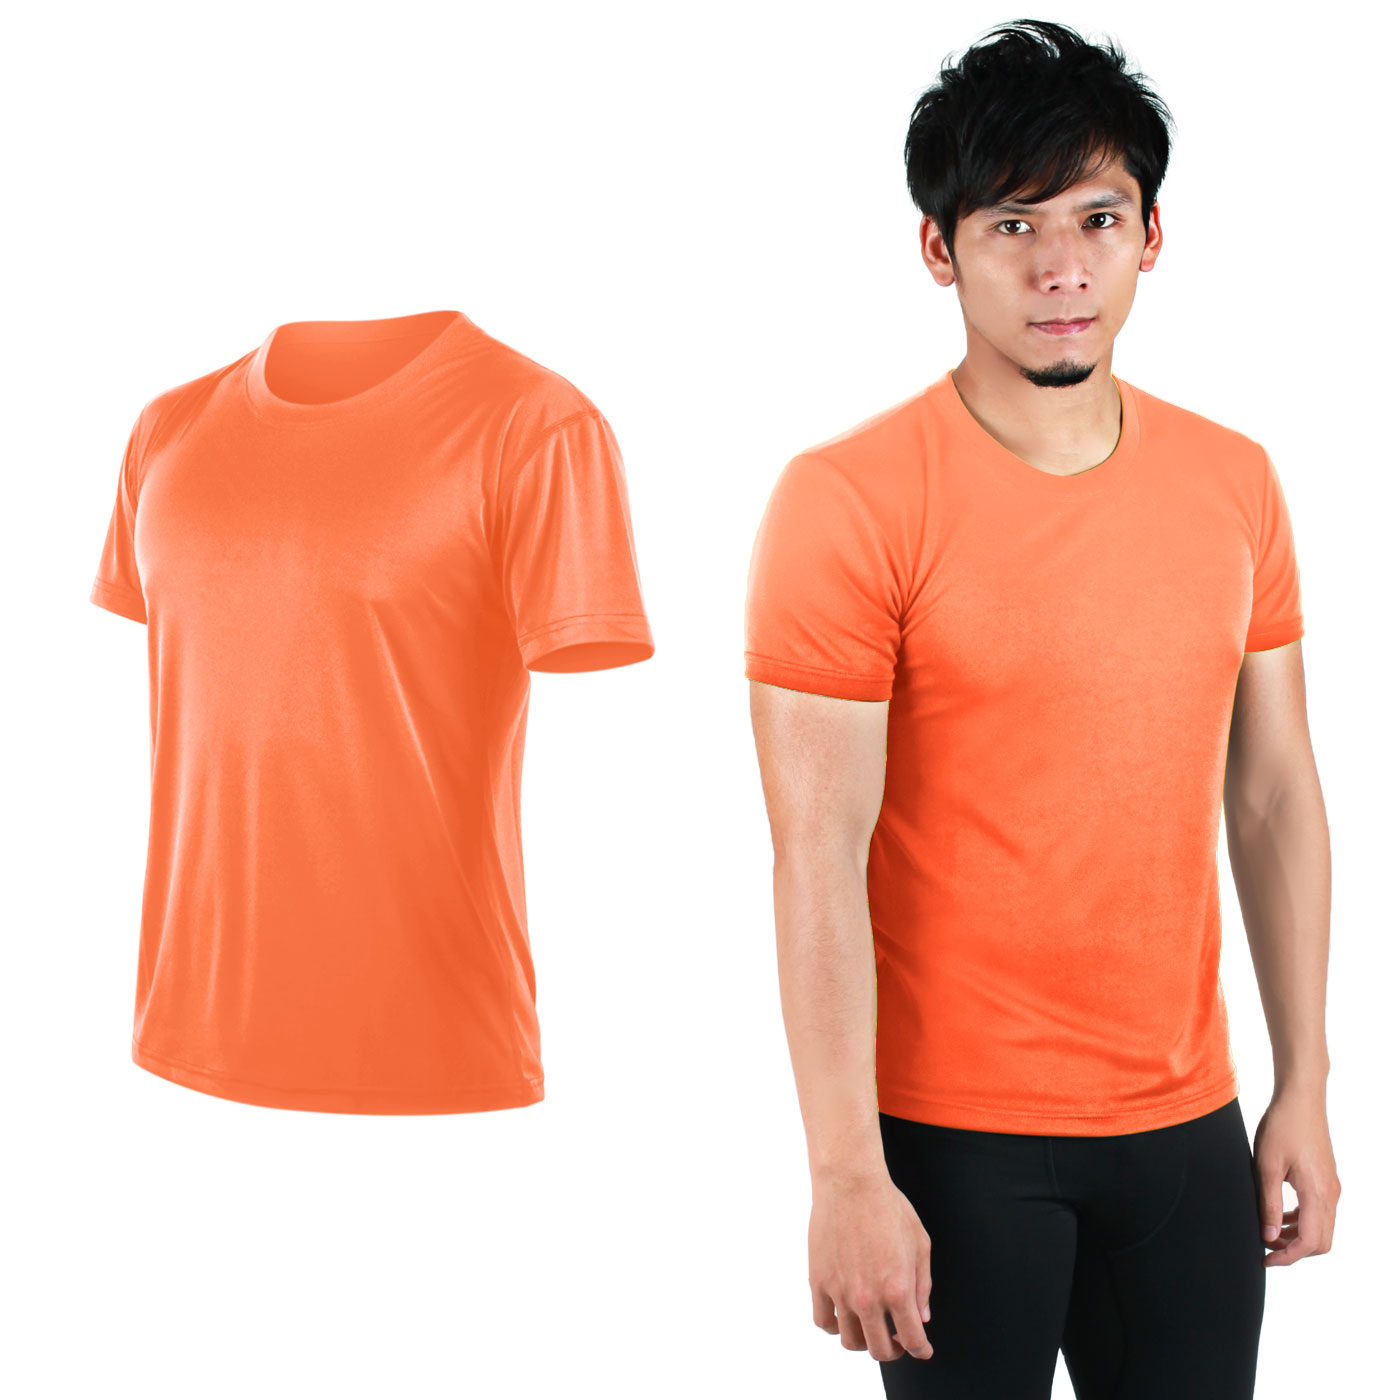 HODARLA FLARE 100 吸濕排汗衫3108301 - 螢光橘